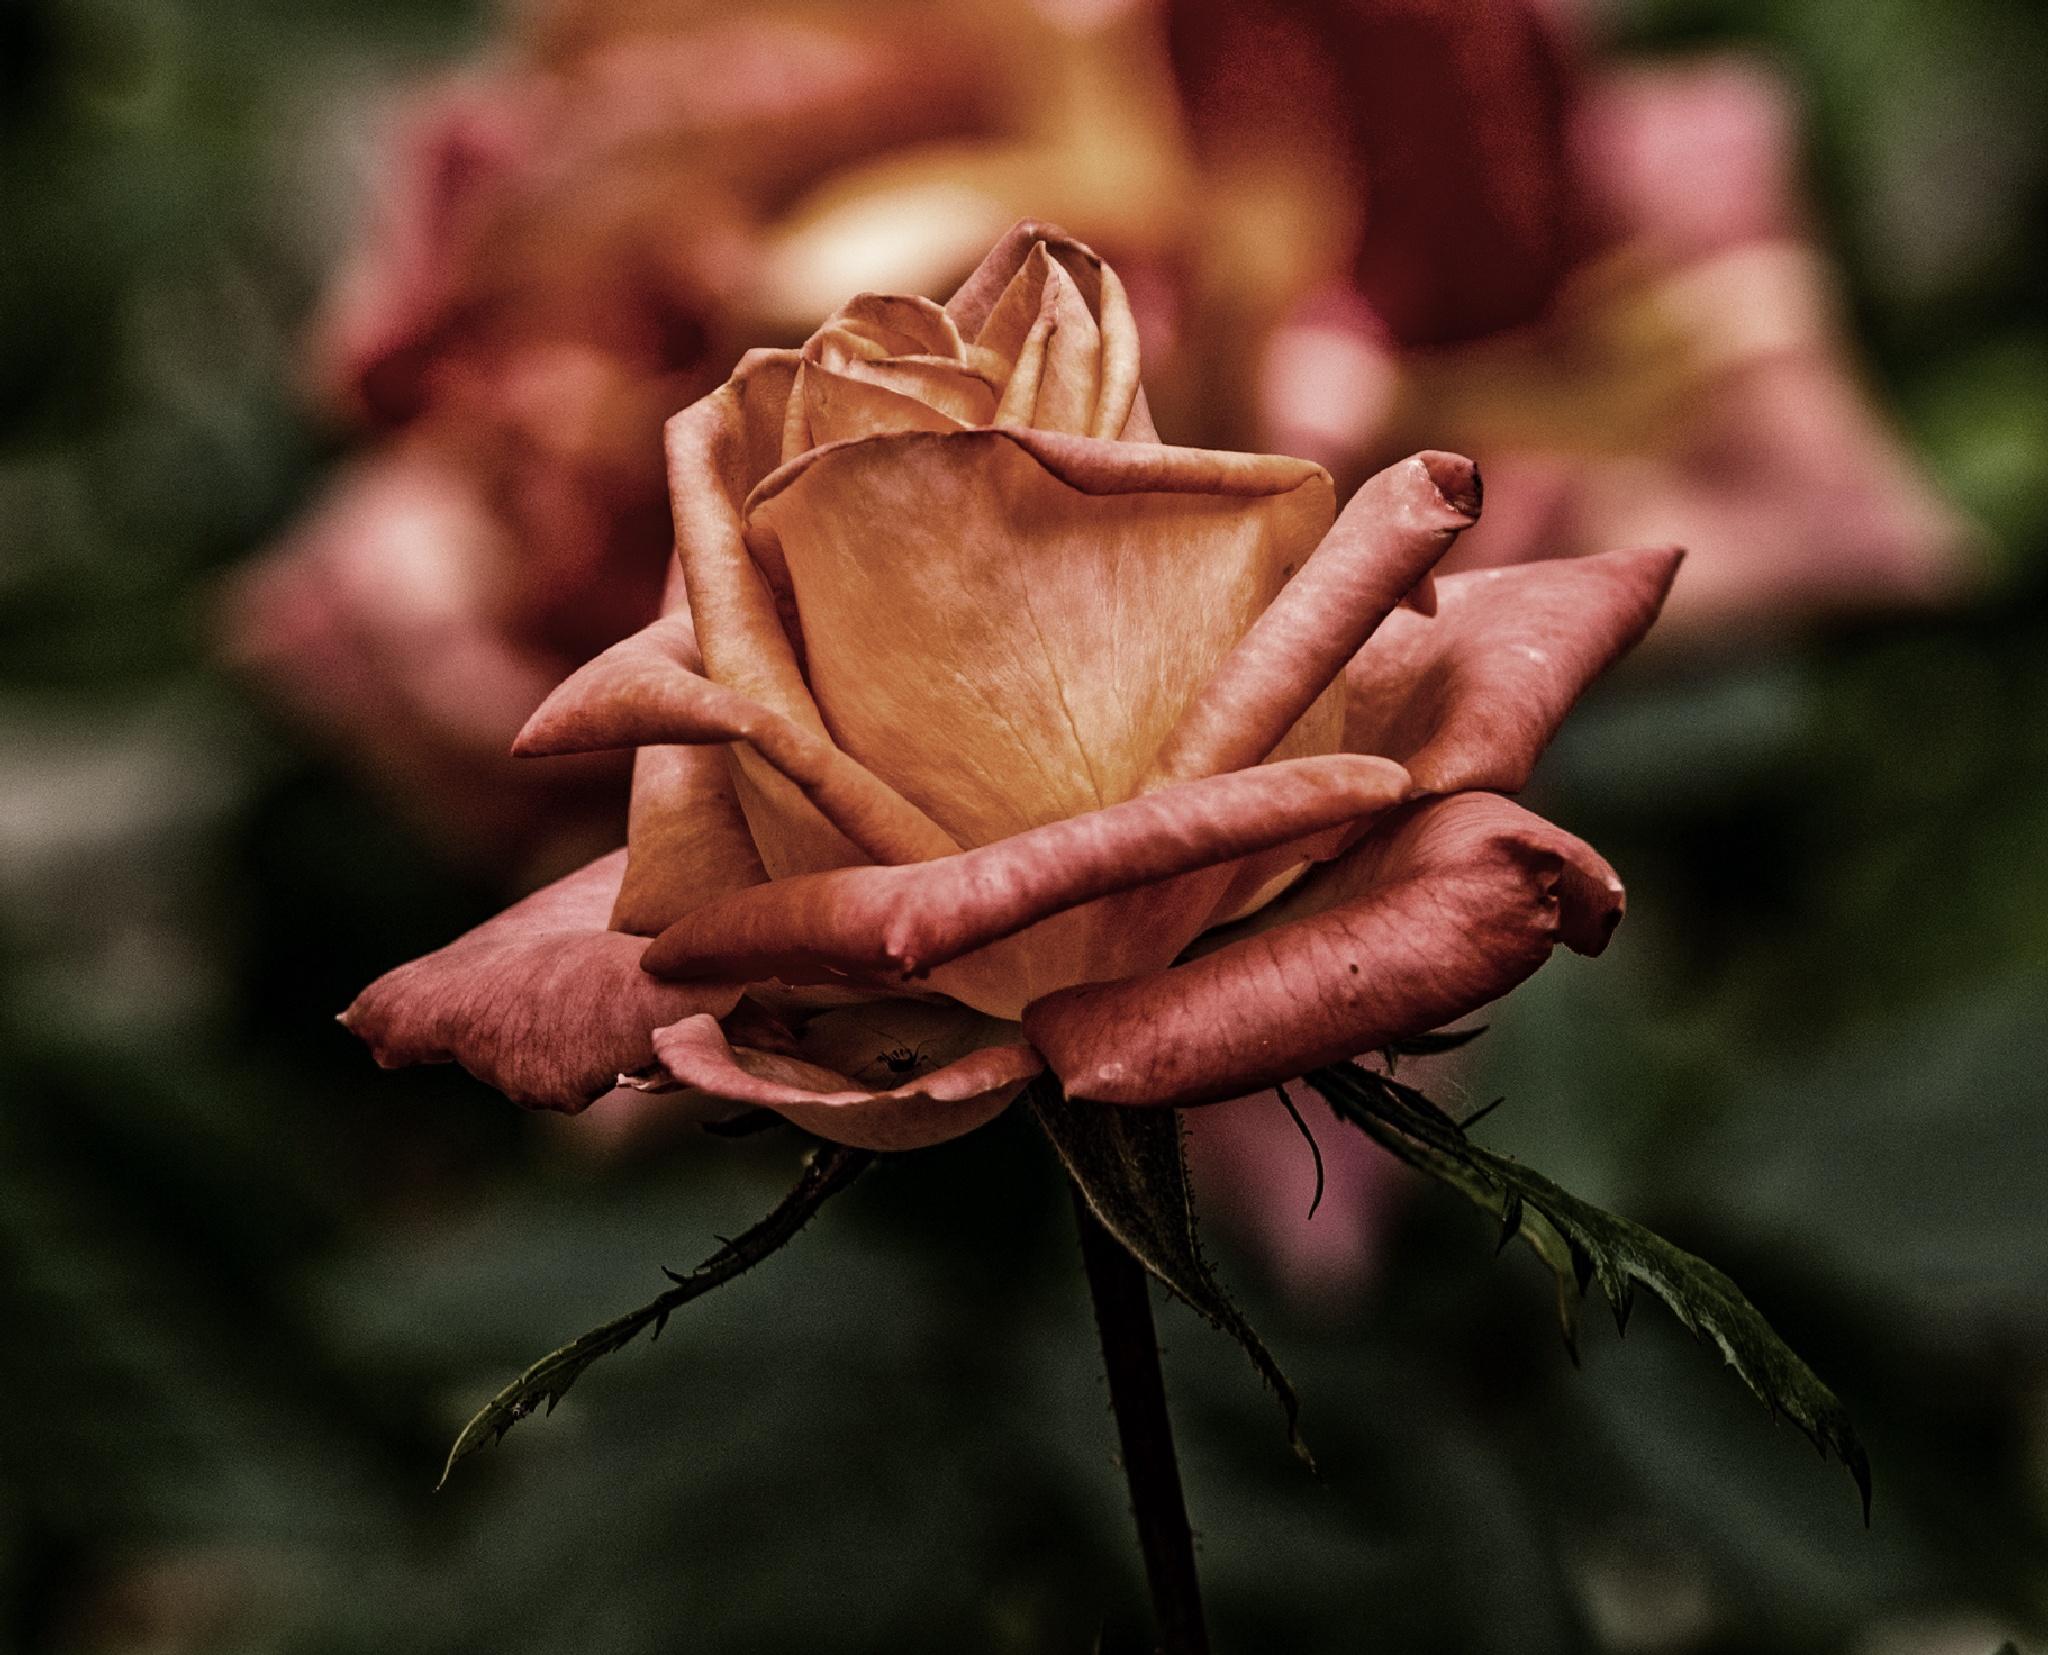 Rosa by corvonero